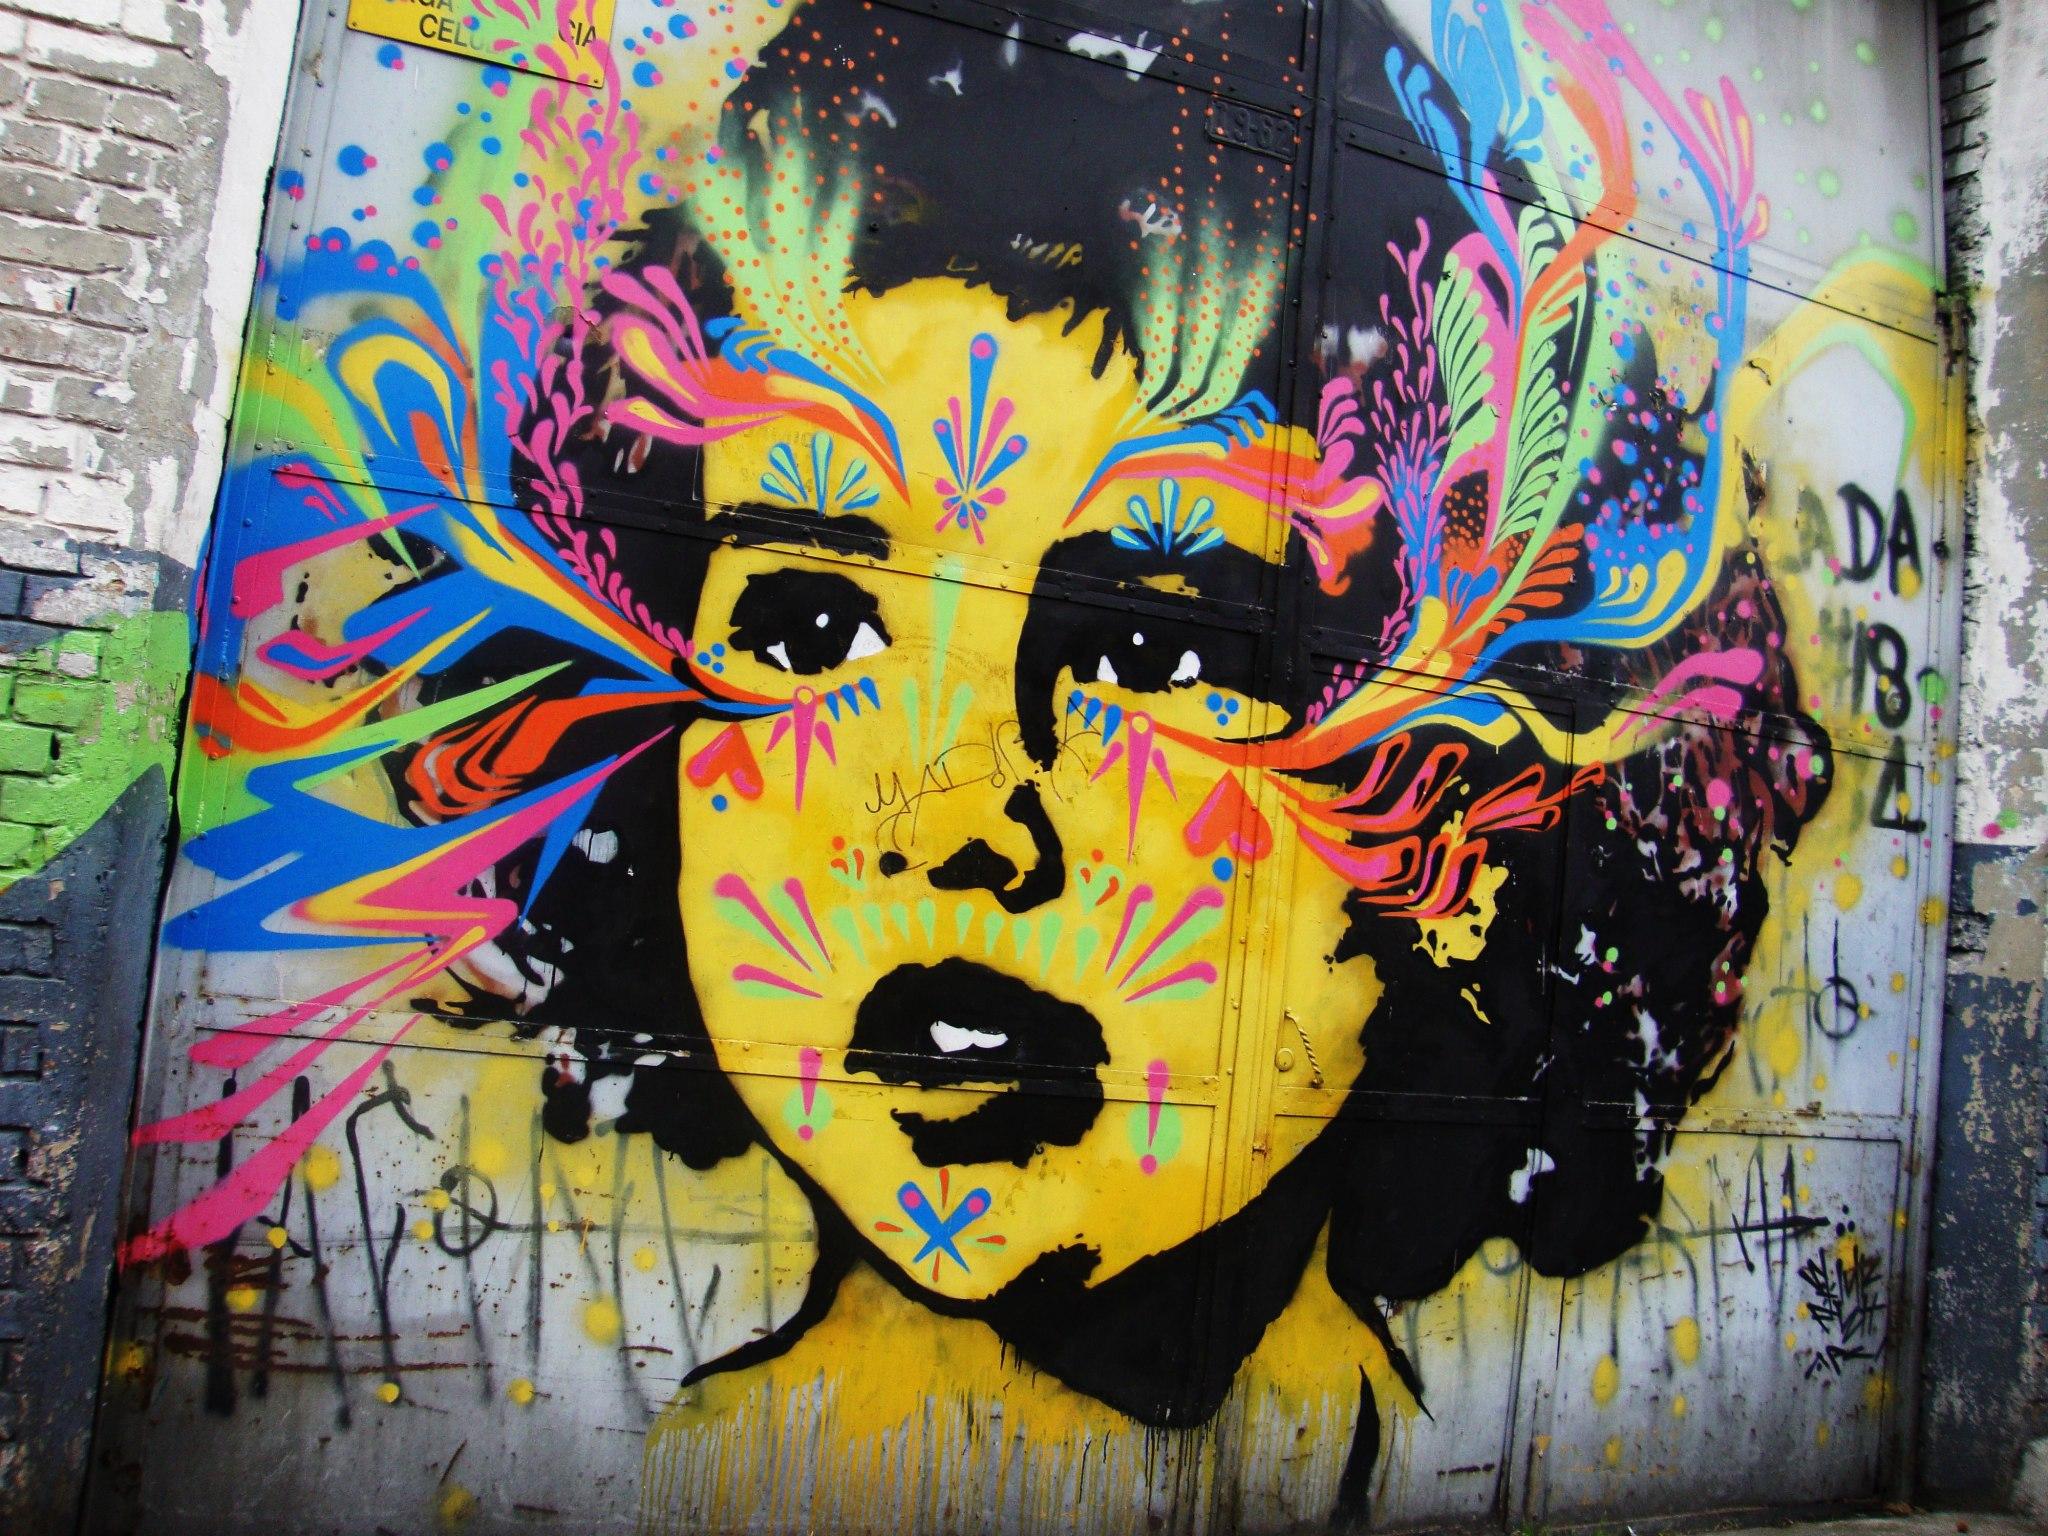 Graffiti in de wijk San Façon in Bogotá